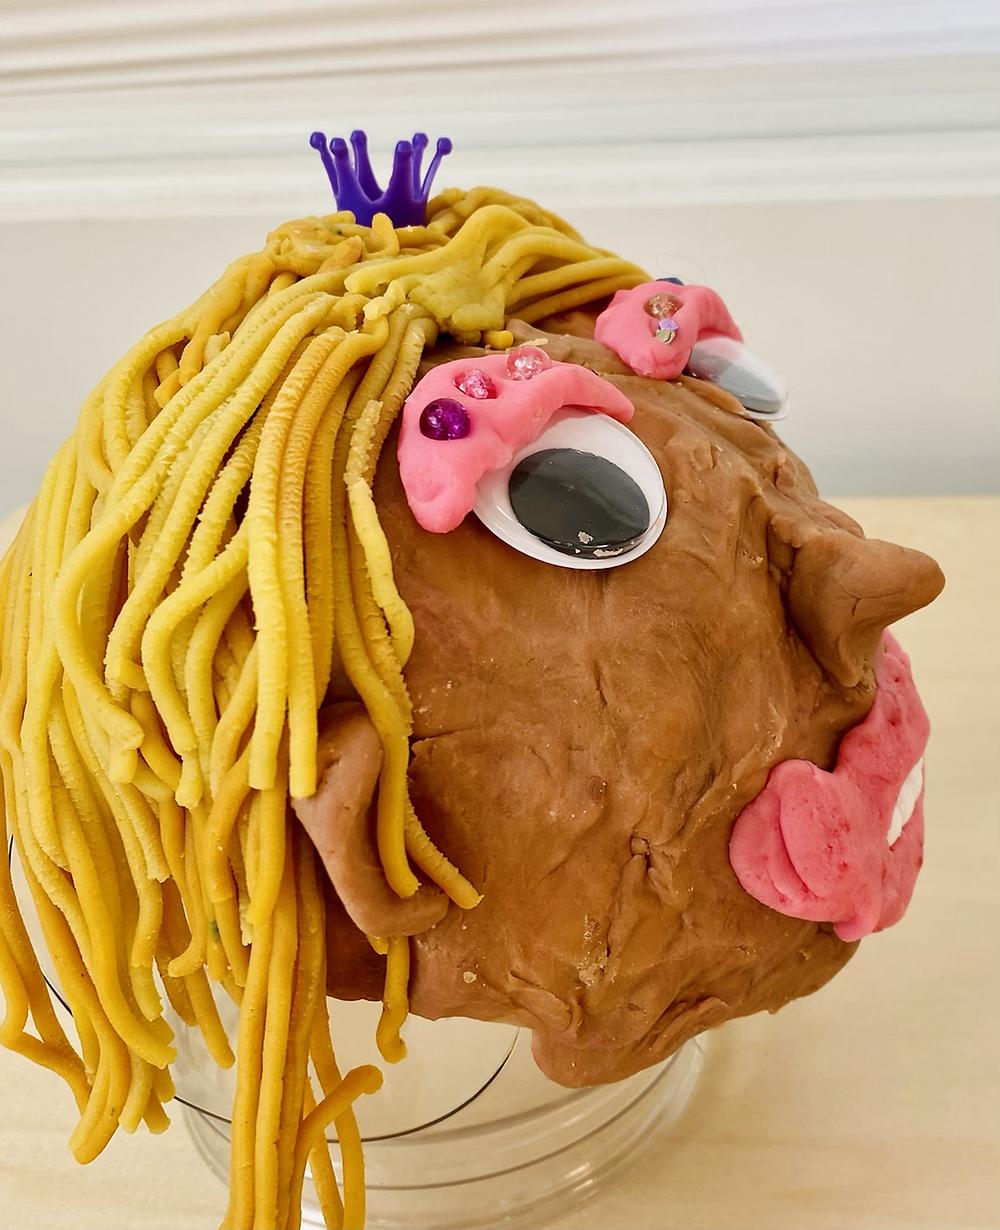 Playdoh head